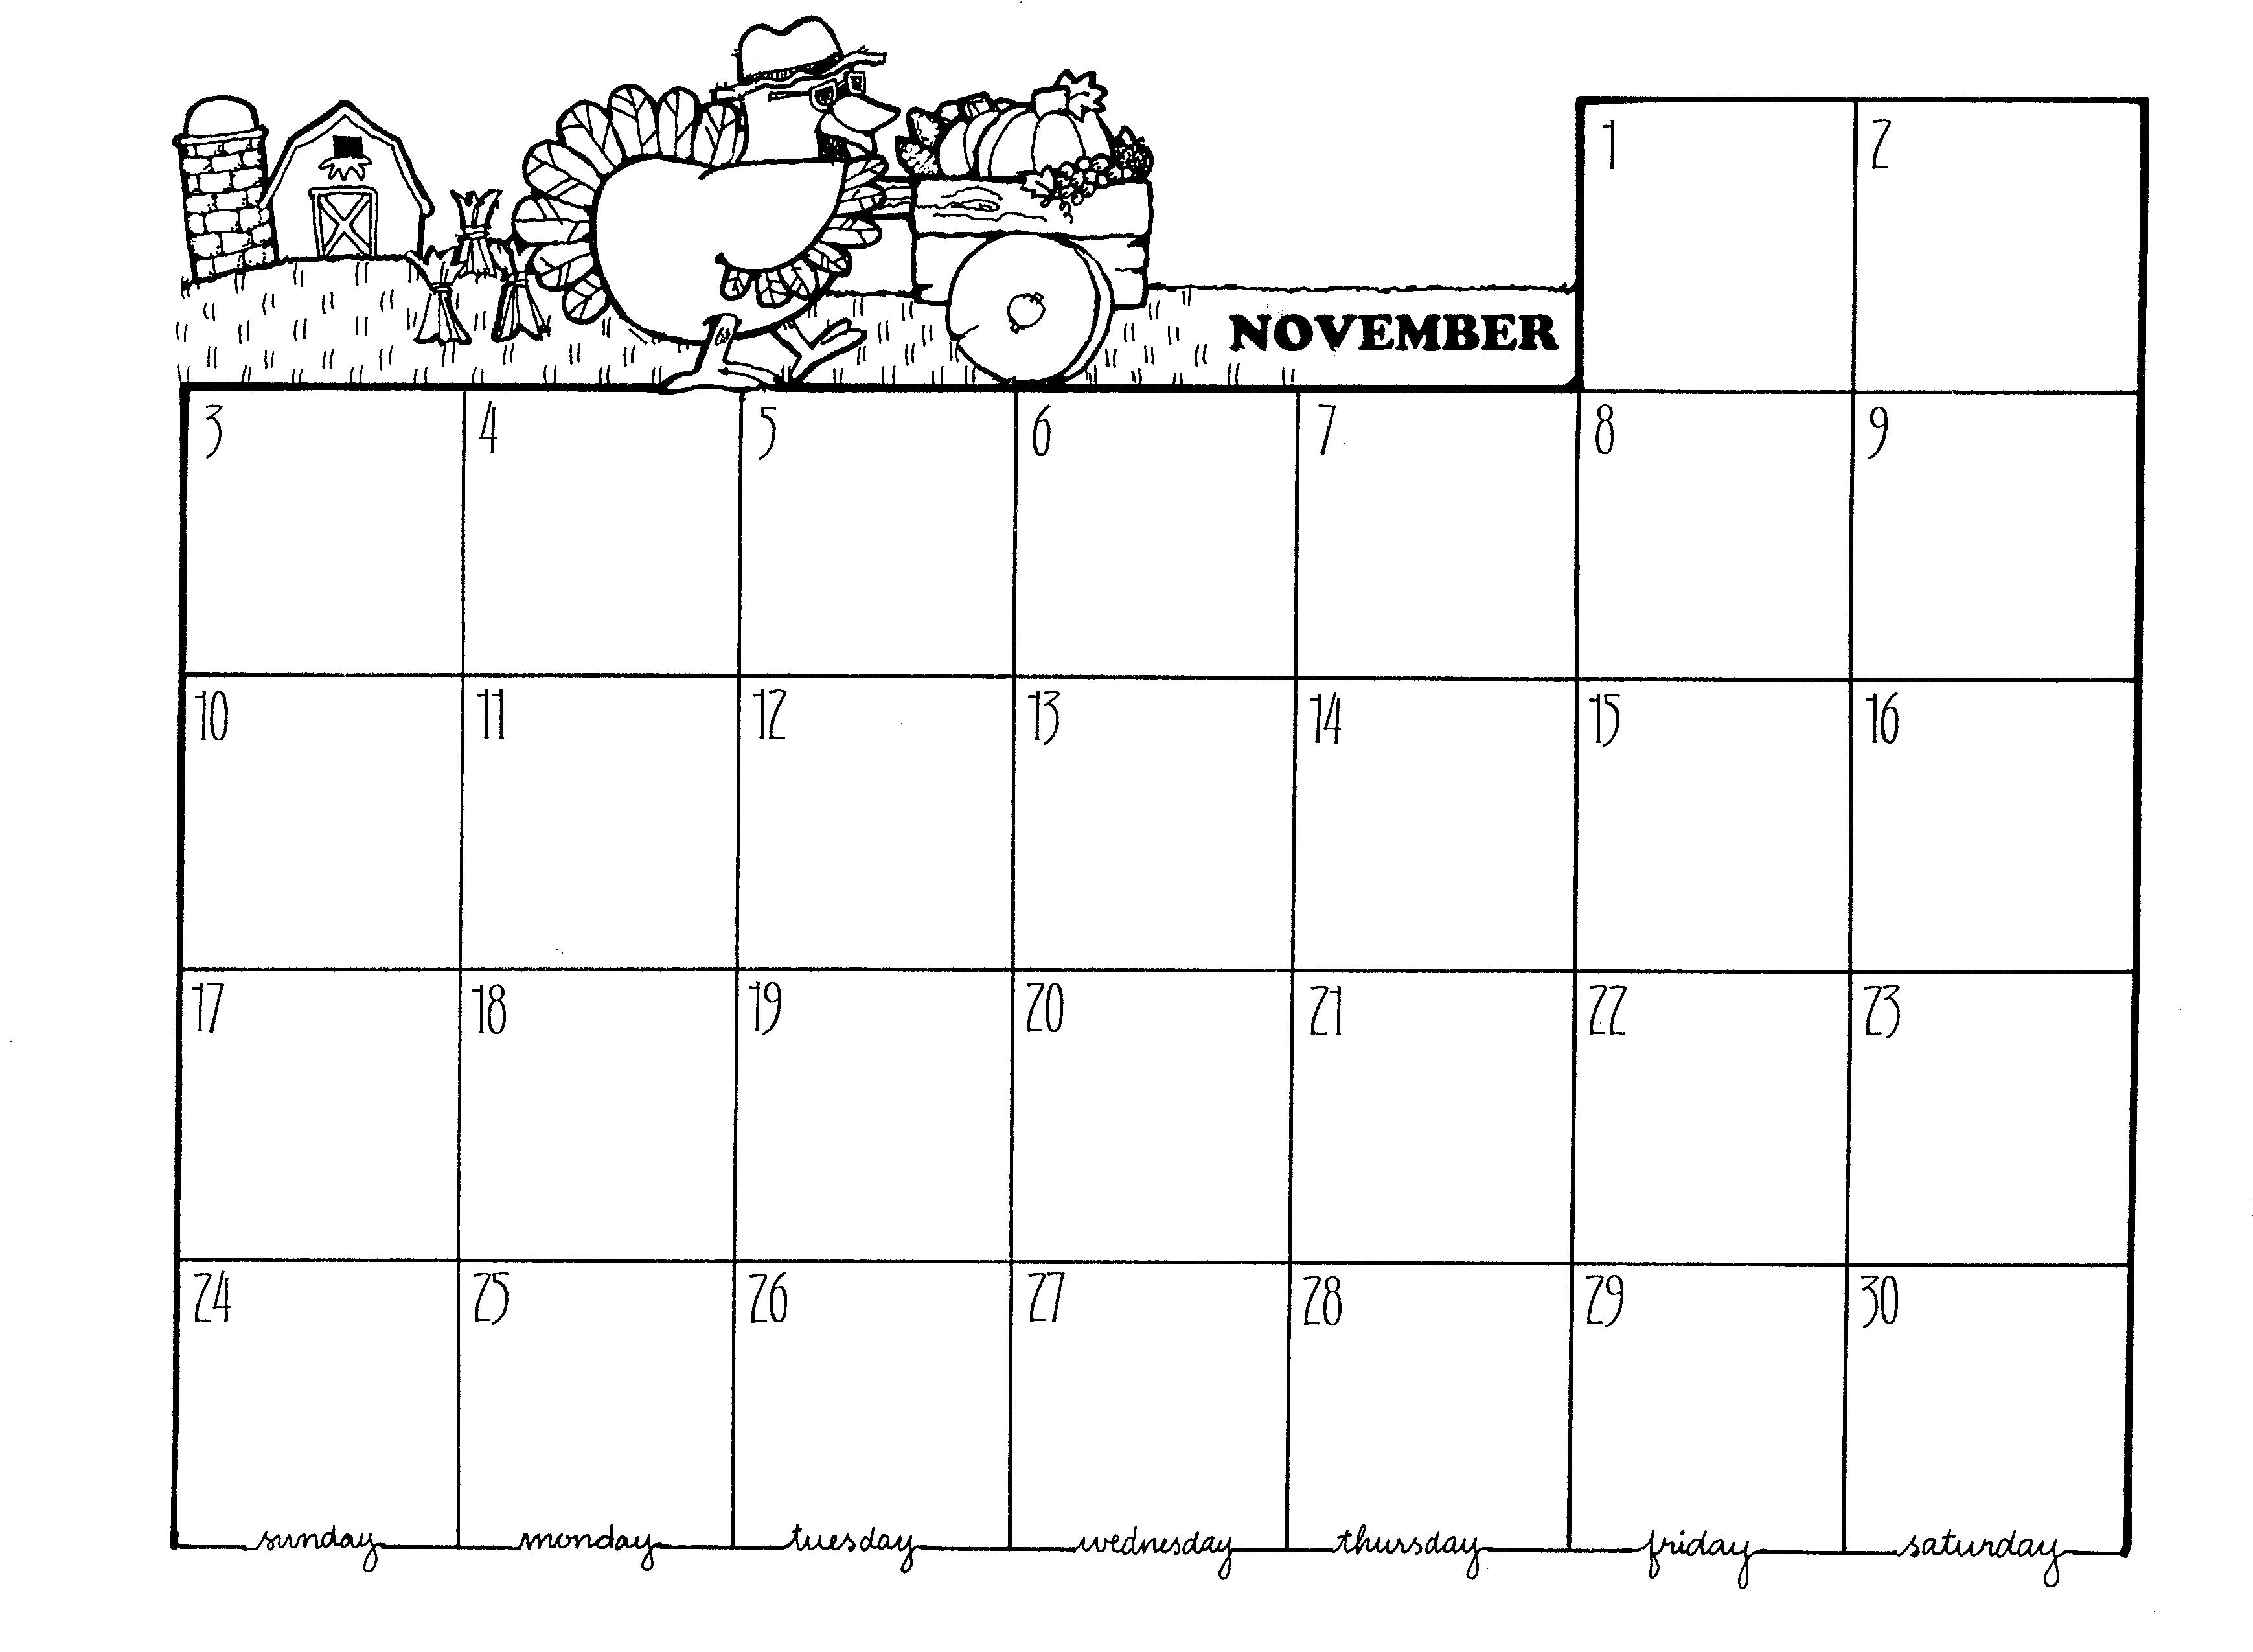 November Calendar Clipart Black And White.